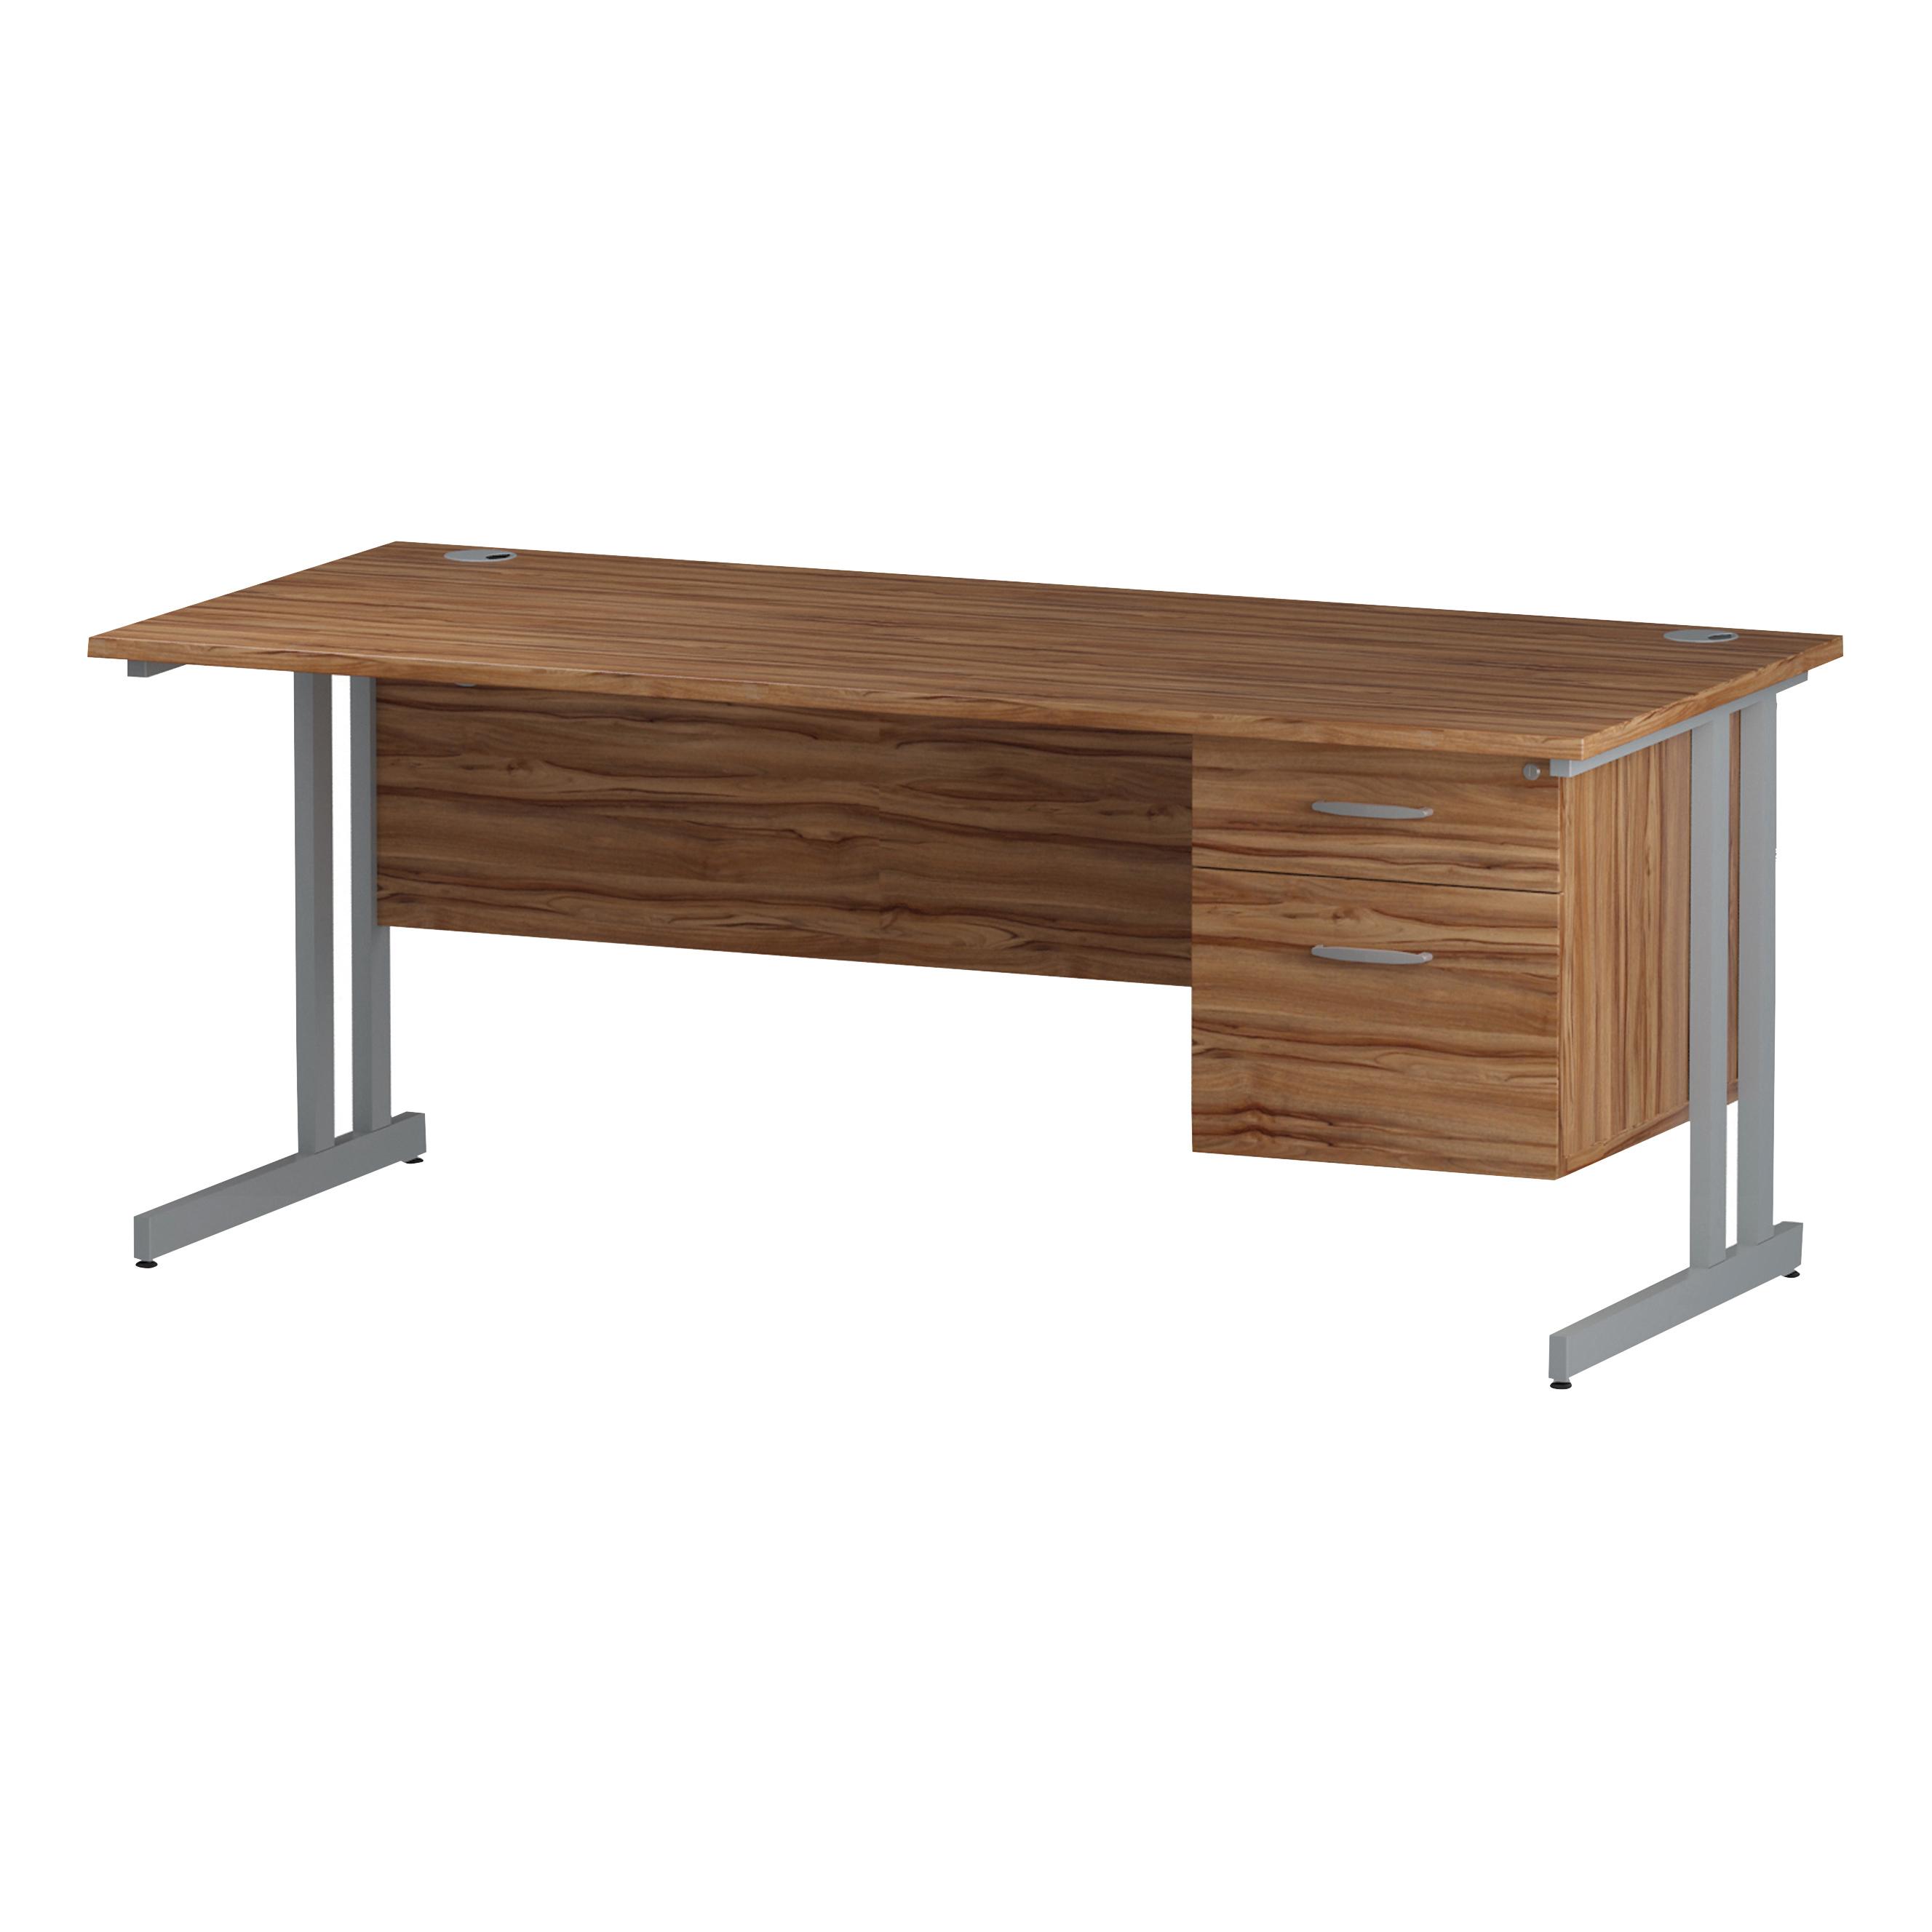 Trexus Rectangular Desk Silver Cantilever Leg 1800x800mm Fixed Pedestal 2 Drawers Walnut Ref I001922